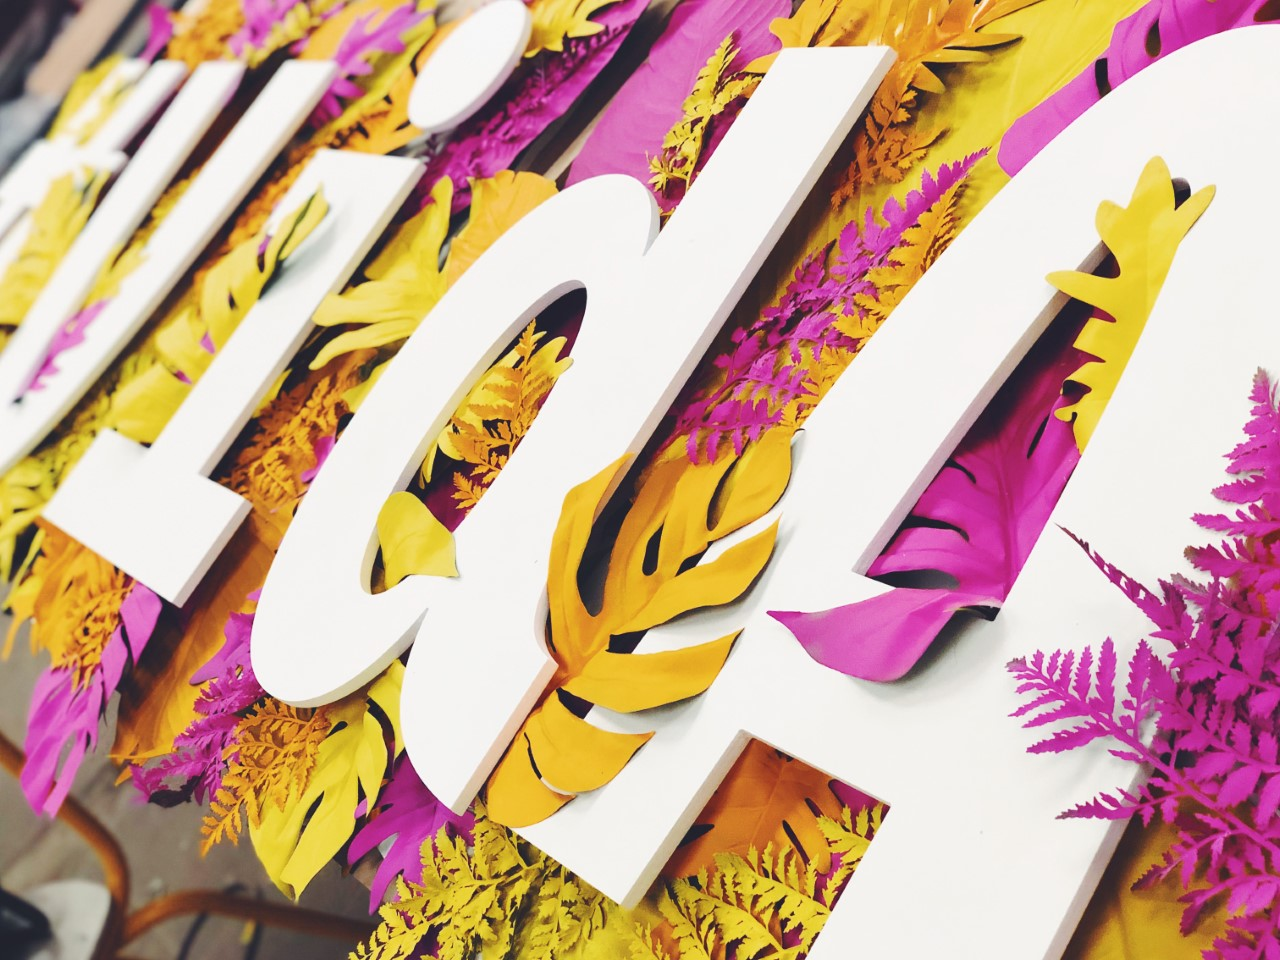 vidaclub-flores-vida-festivales-2019-27lletres-03.jpg